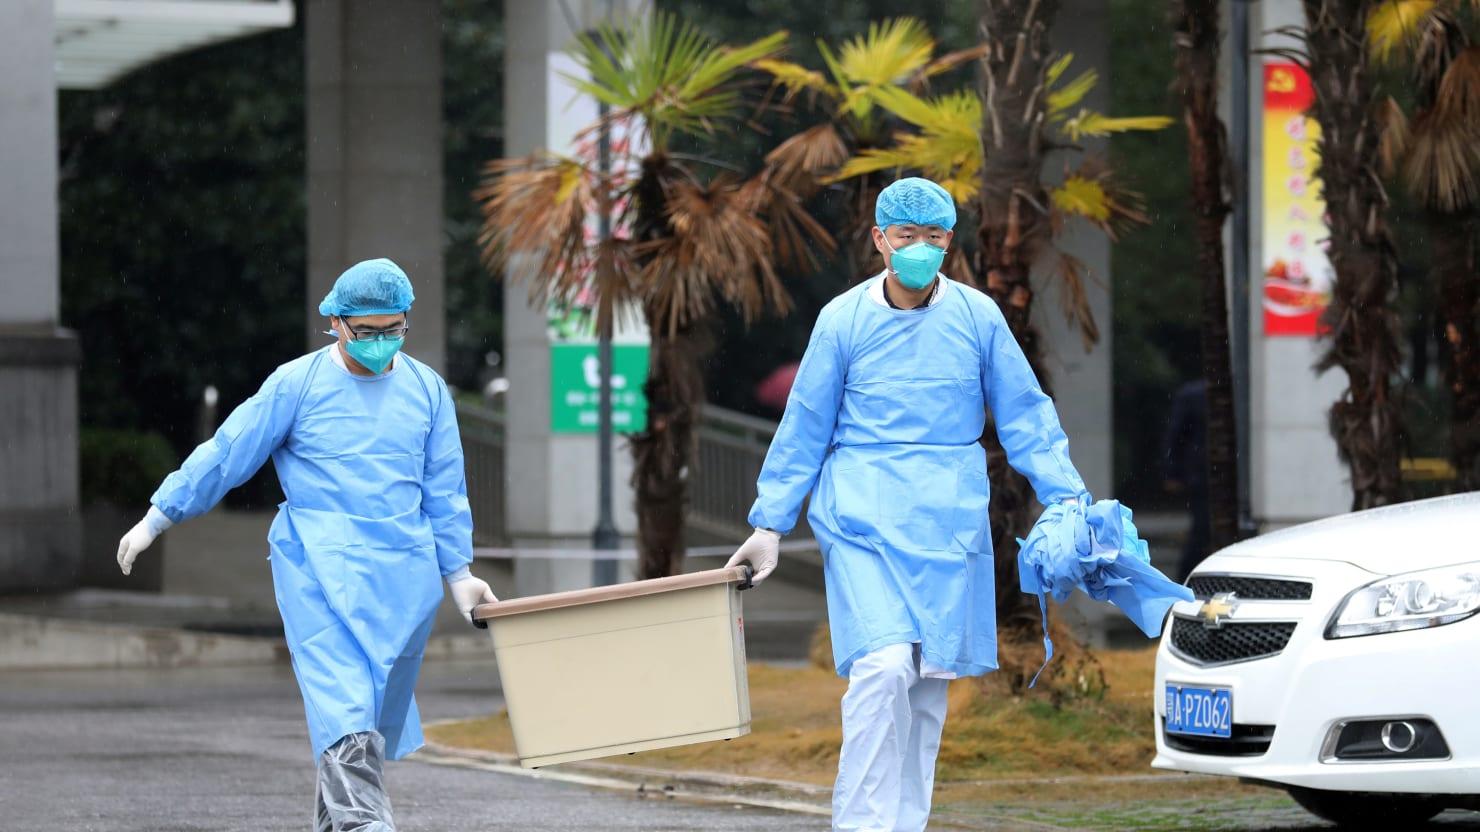 5th US Case of Coronavirus Confirmed in Arizona